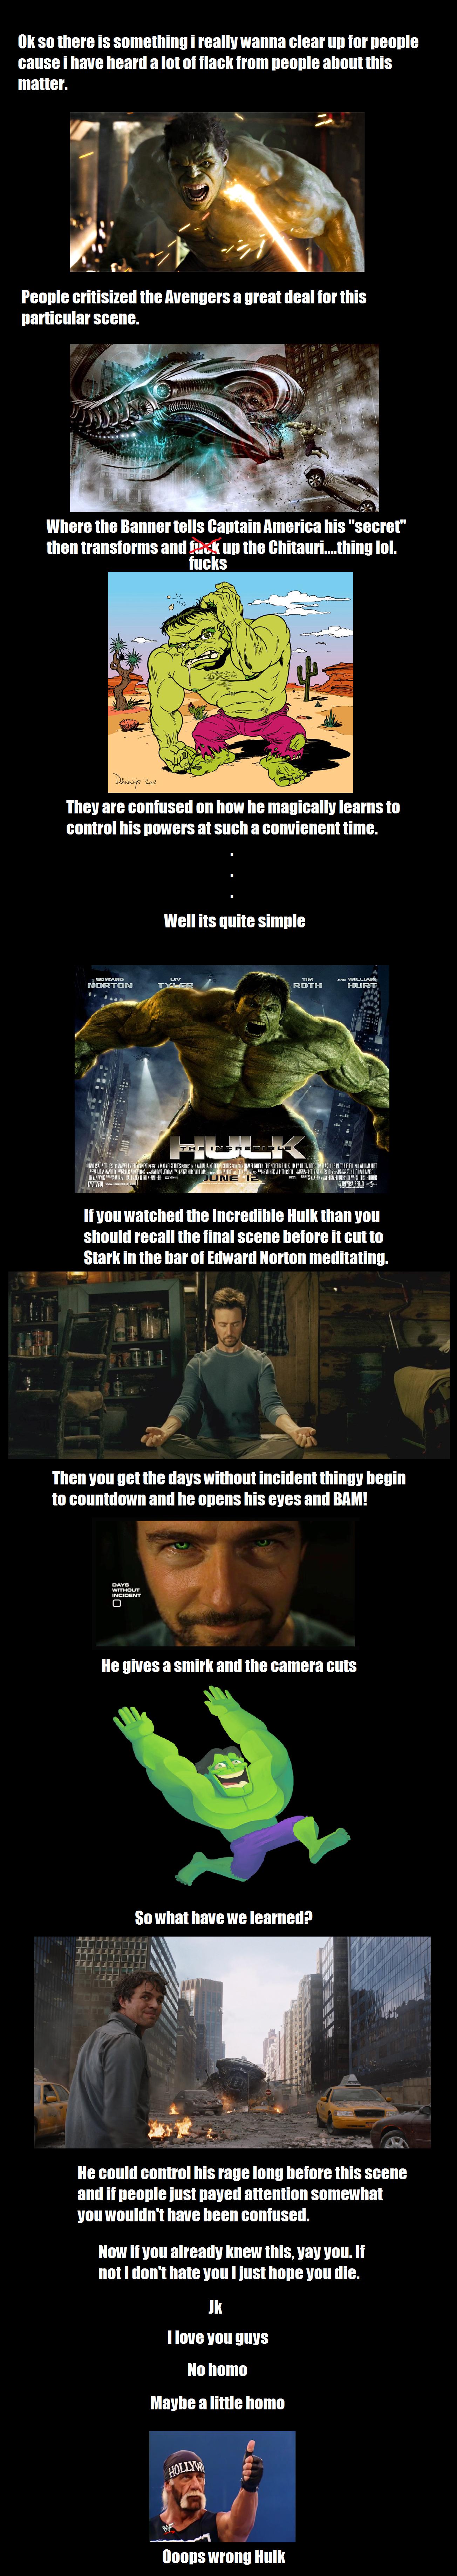 Hulk Talk. Seriously though no homo.